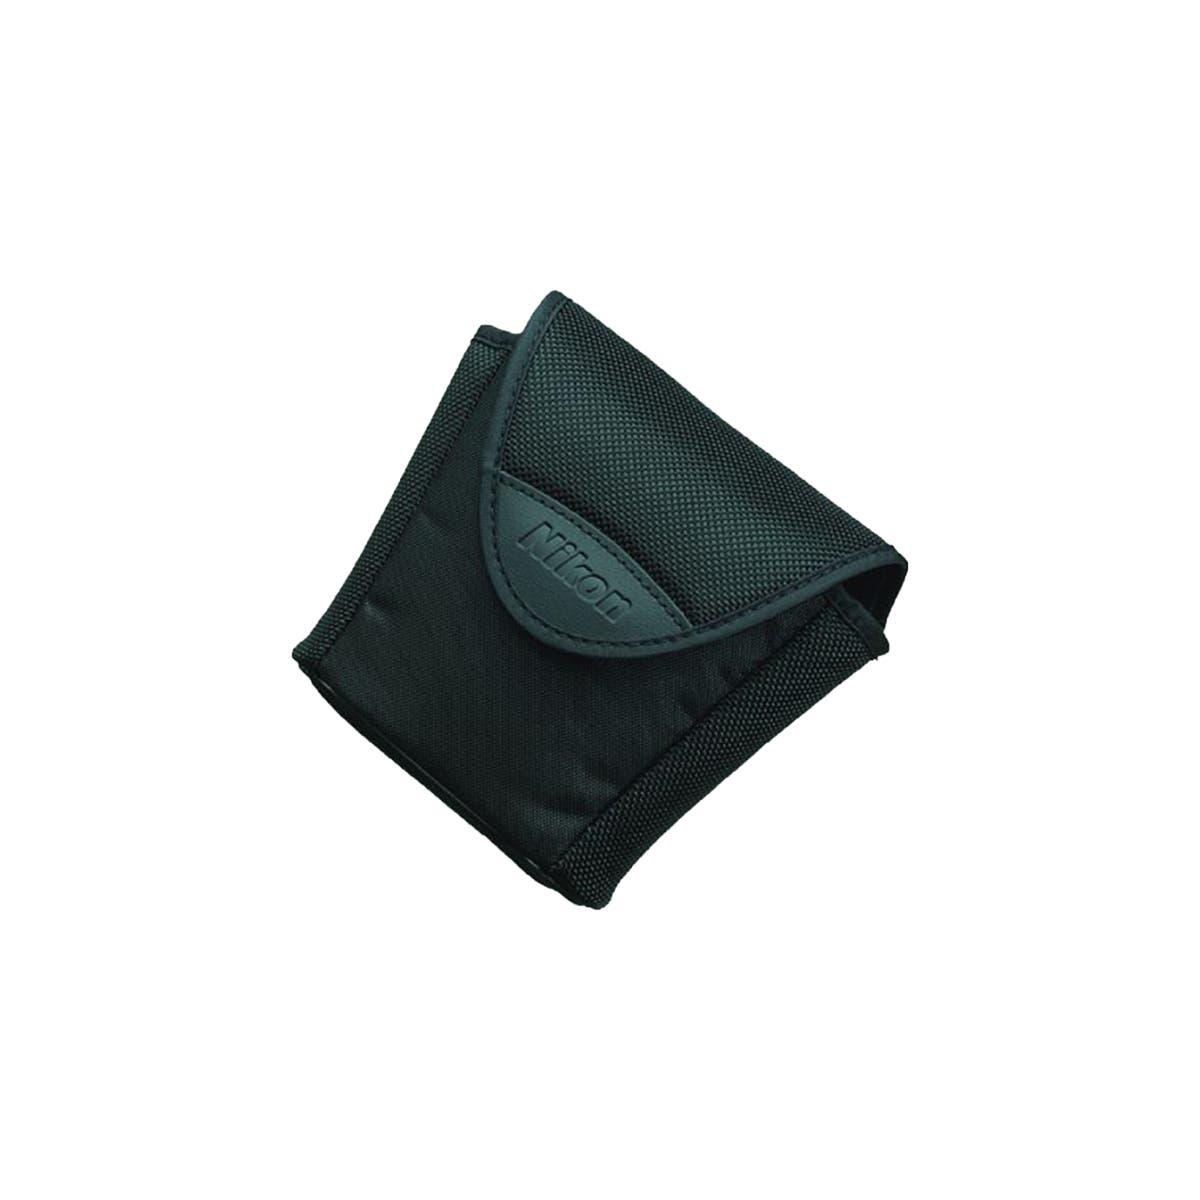 Travelite EX 25mm case